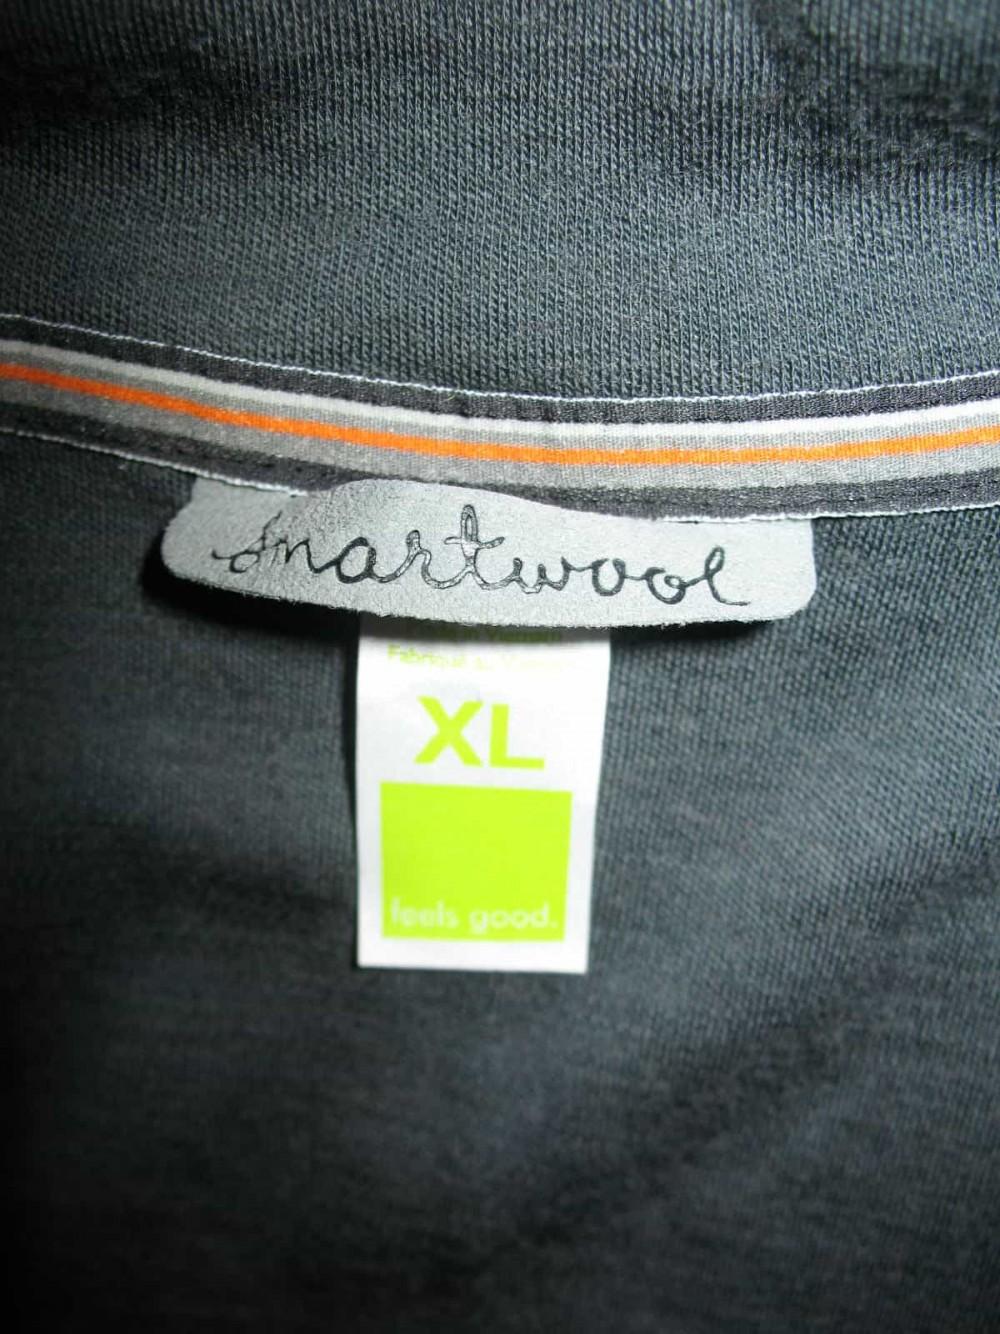 Кофта SMARTWOOL merino 250 base layer 1/4 zip grey jersey (размер XL) - 4